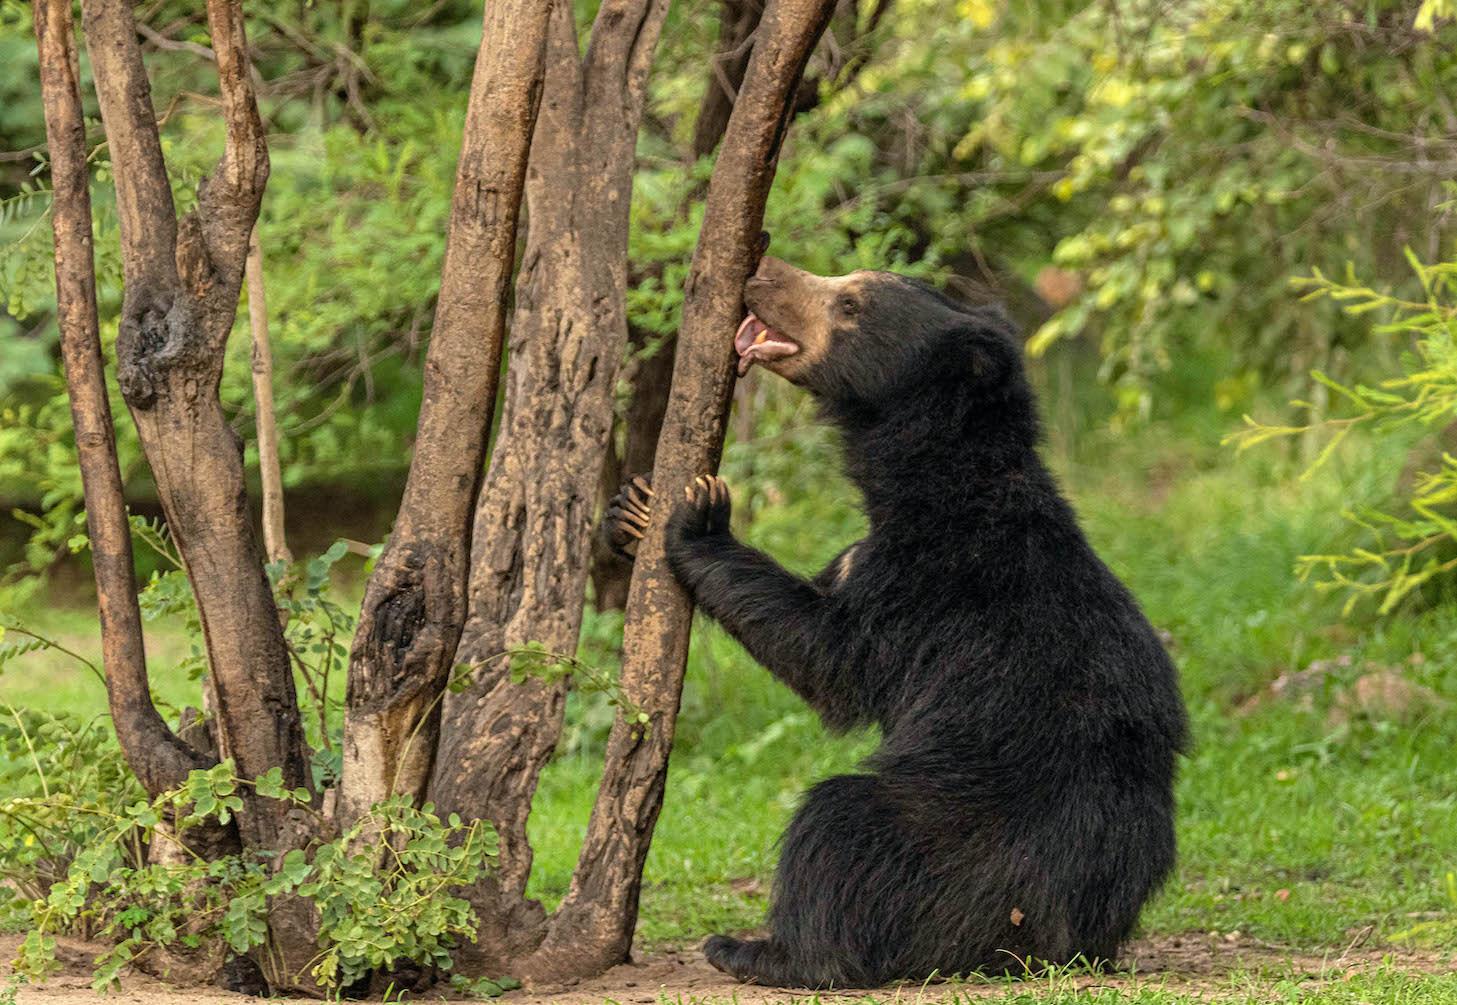 Sloth bear licking the bark of a tree in Daroji